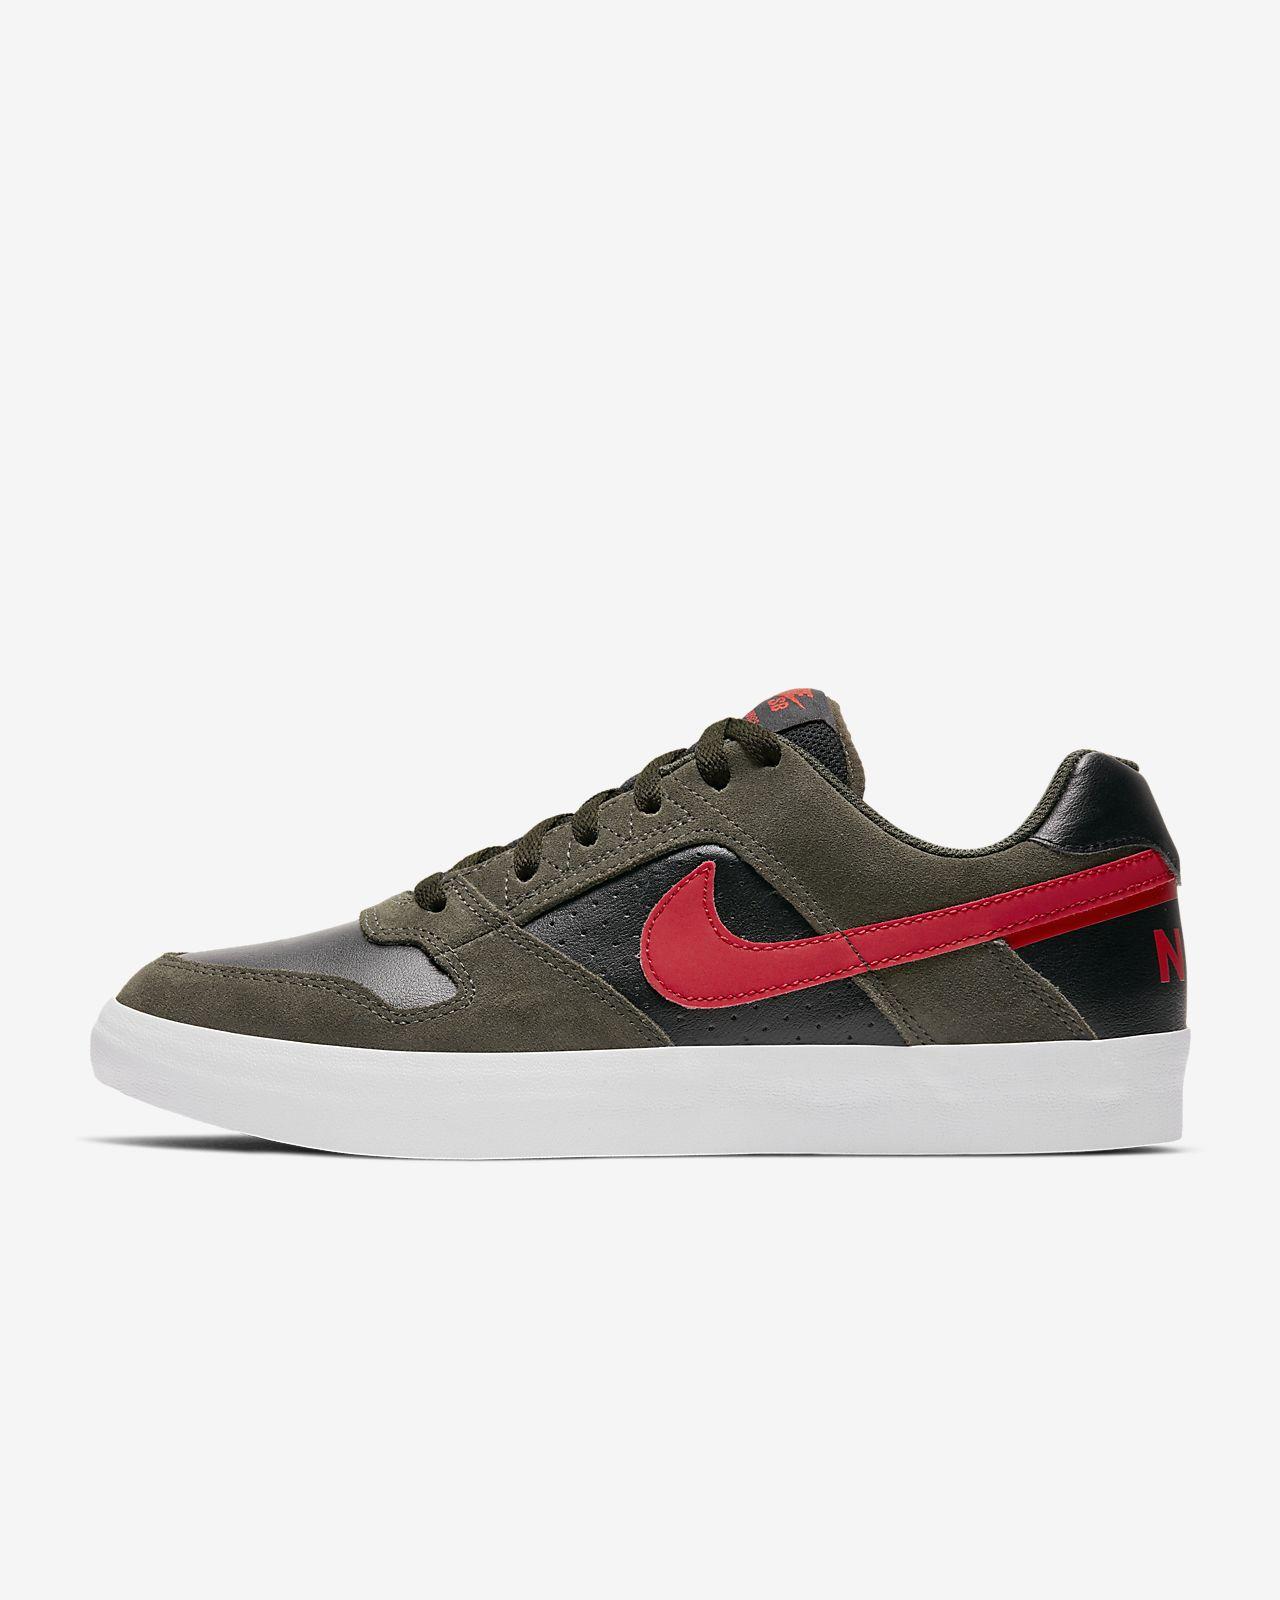 Nike SB Delta Force Vulc Herren-Skateboardschuh